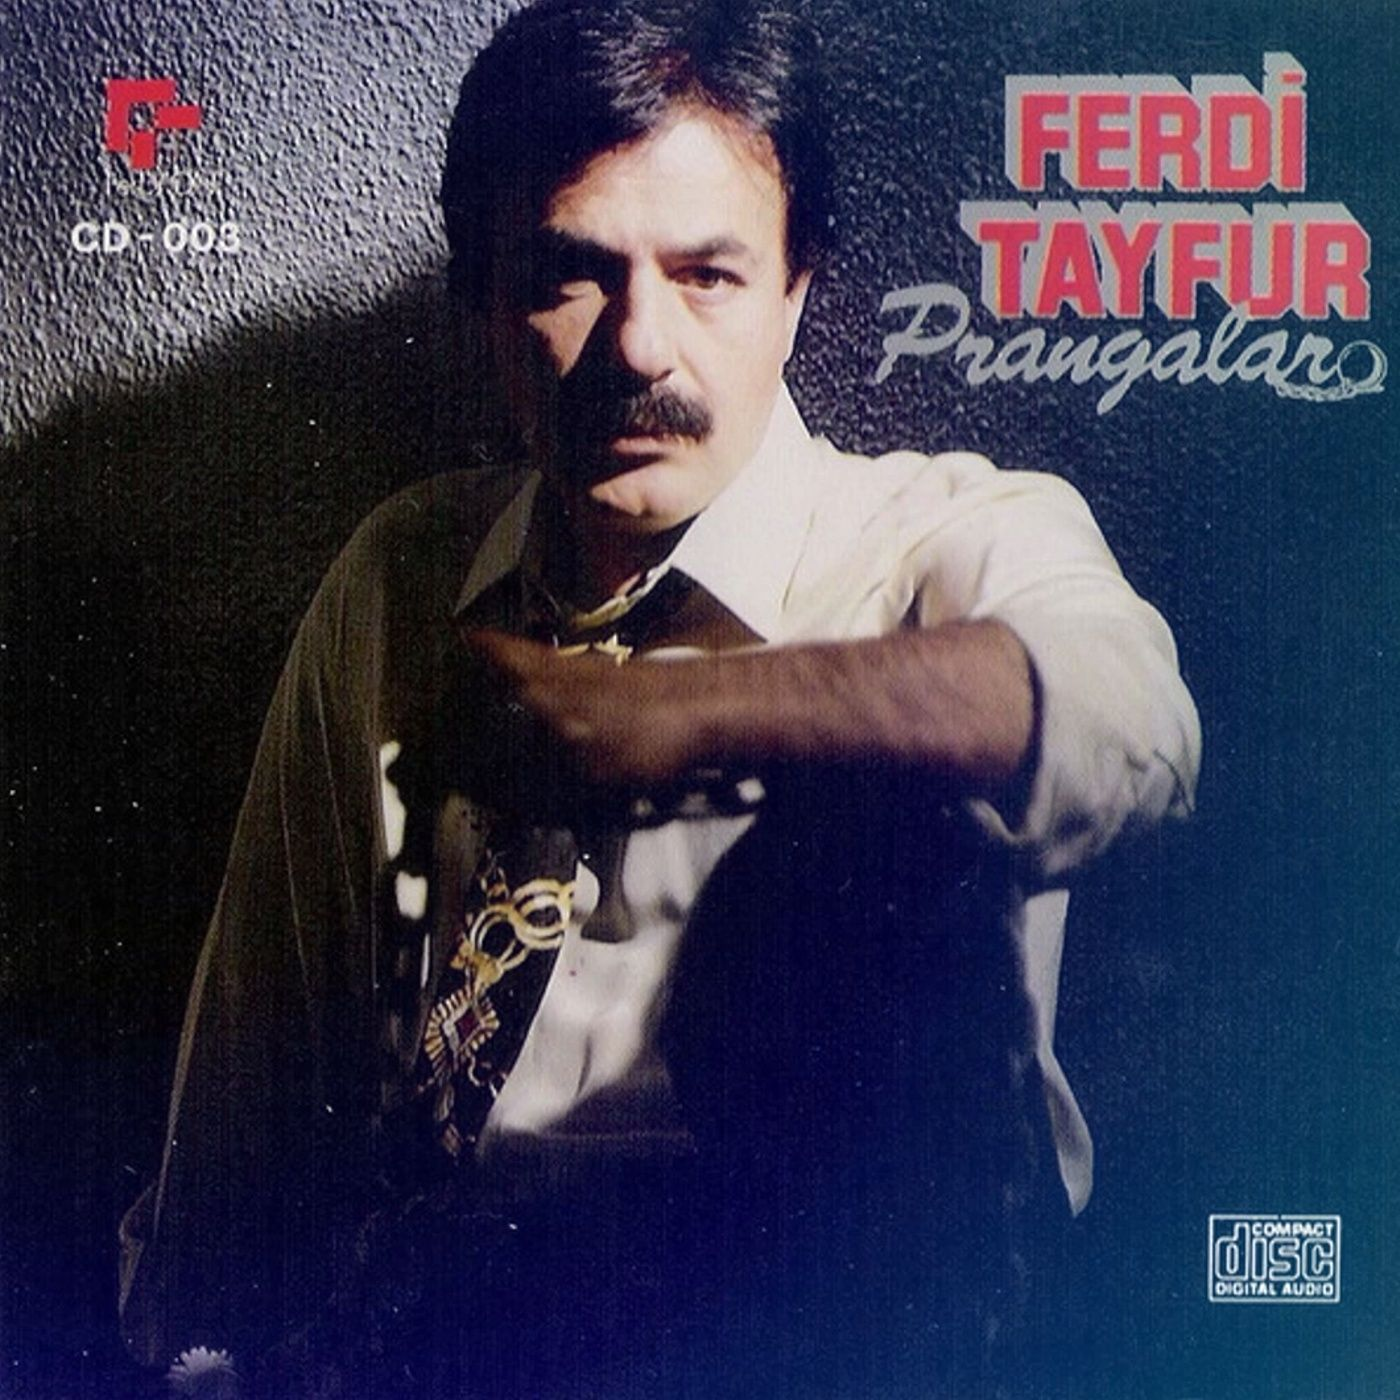 Ferdi Tayfur - Prangalar (Sample Beat)